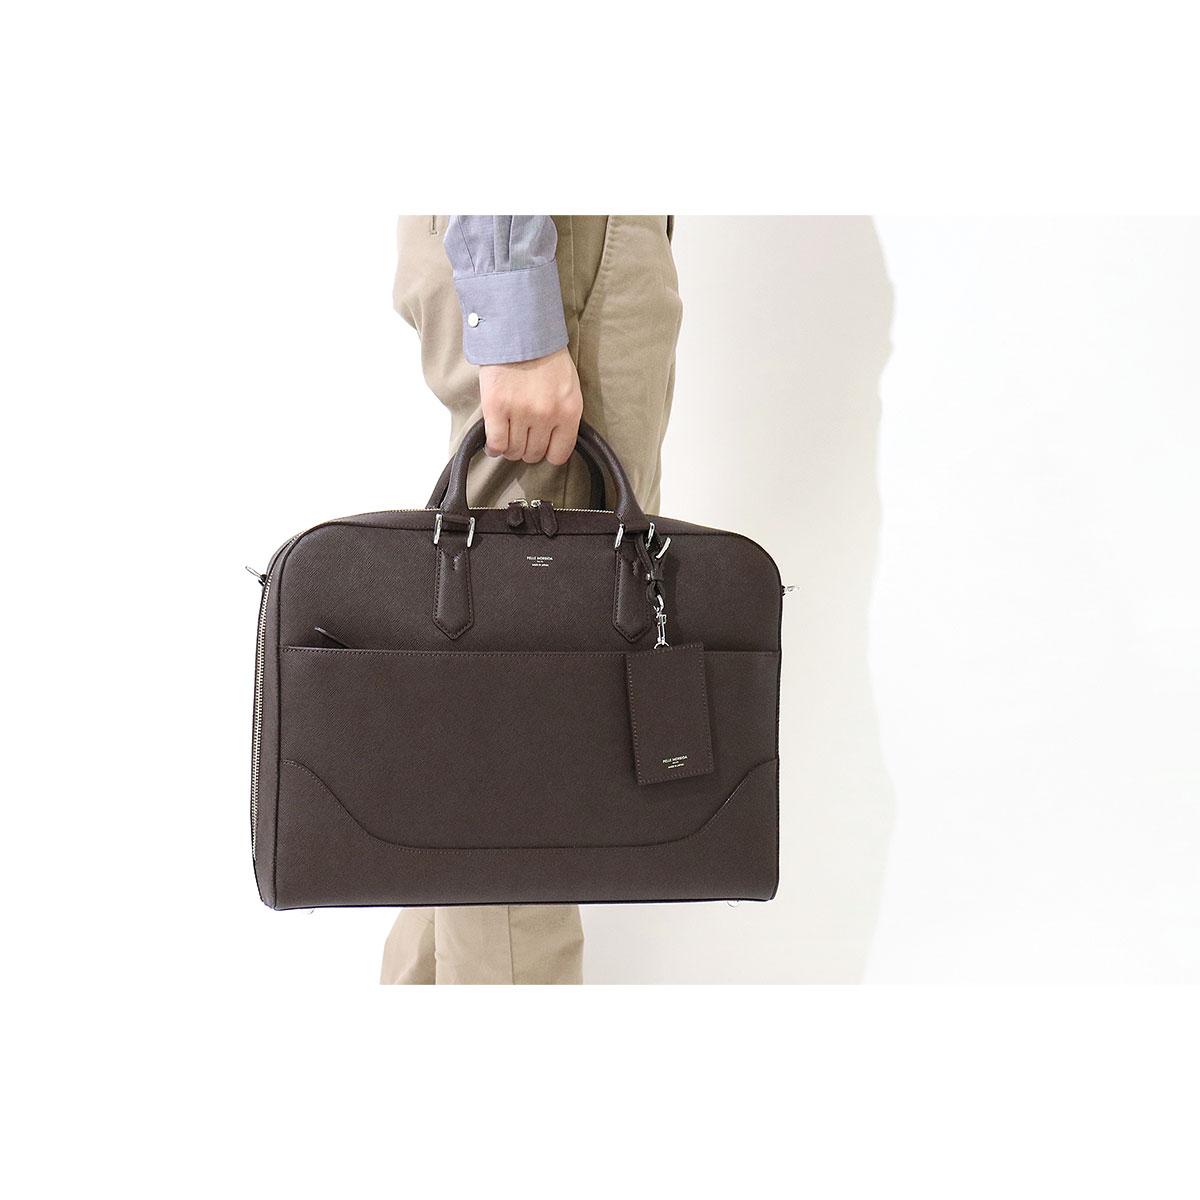 PELLE MORBIDA 2-WAY Briefcase Capitano business bag (B4-aware) leather bag men's CA014